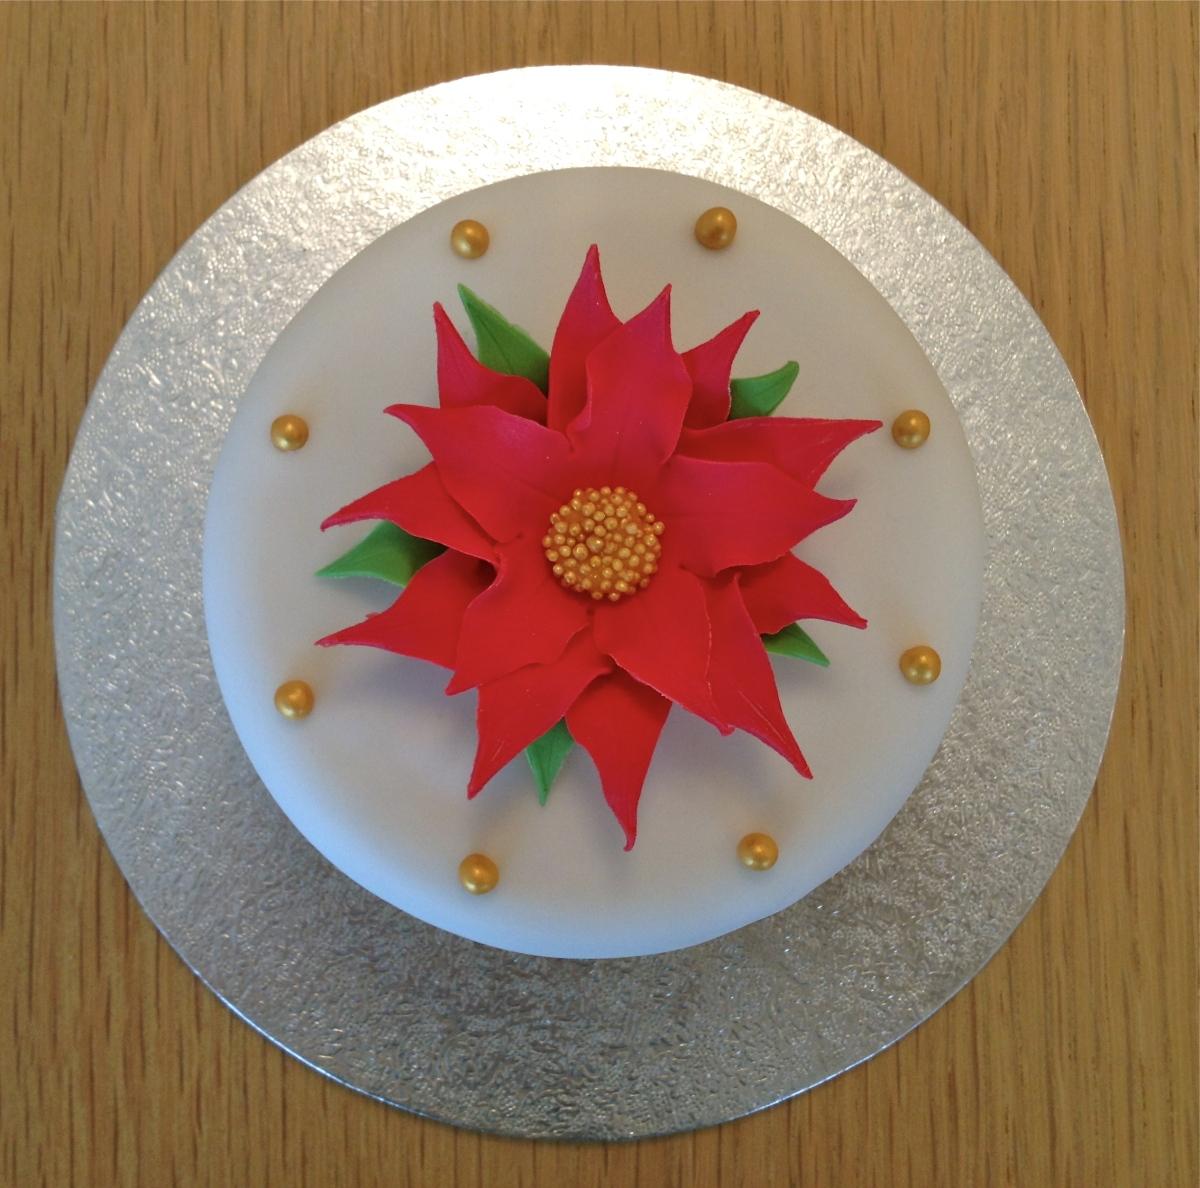 Mini Red Poinsettia Cake